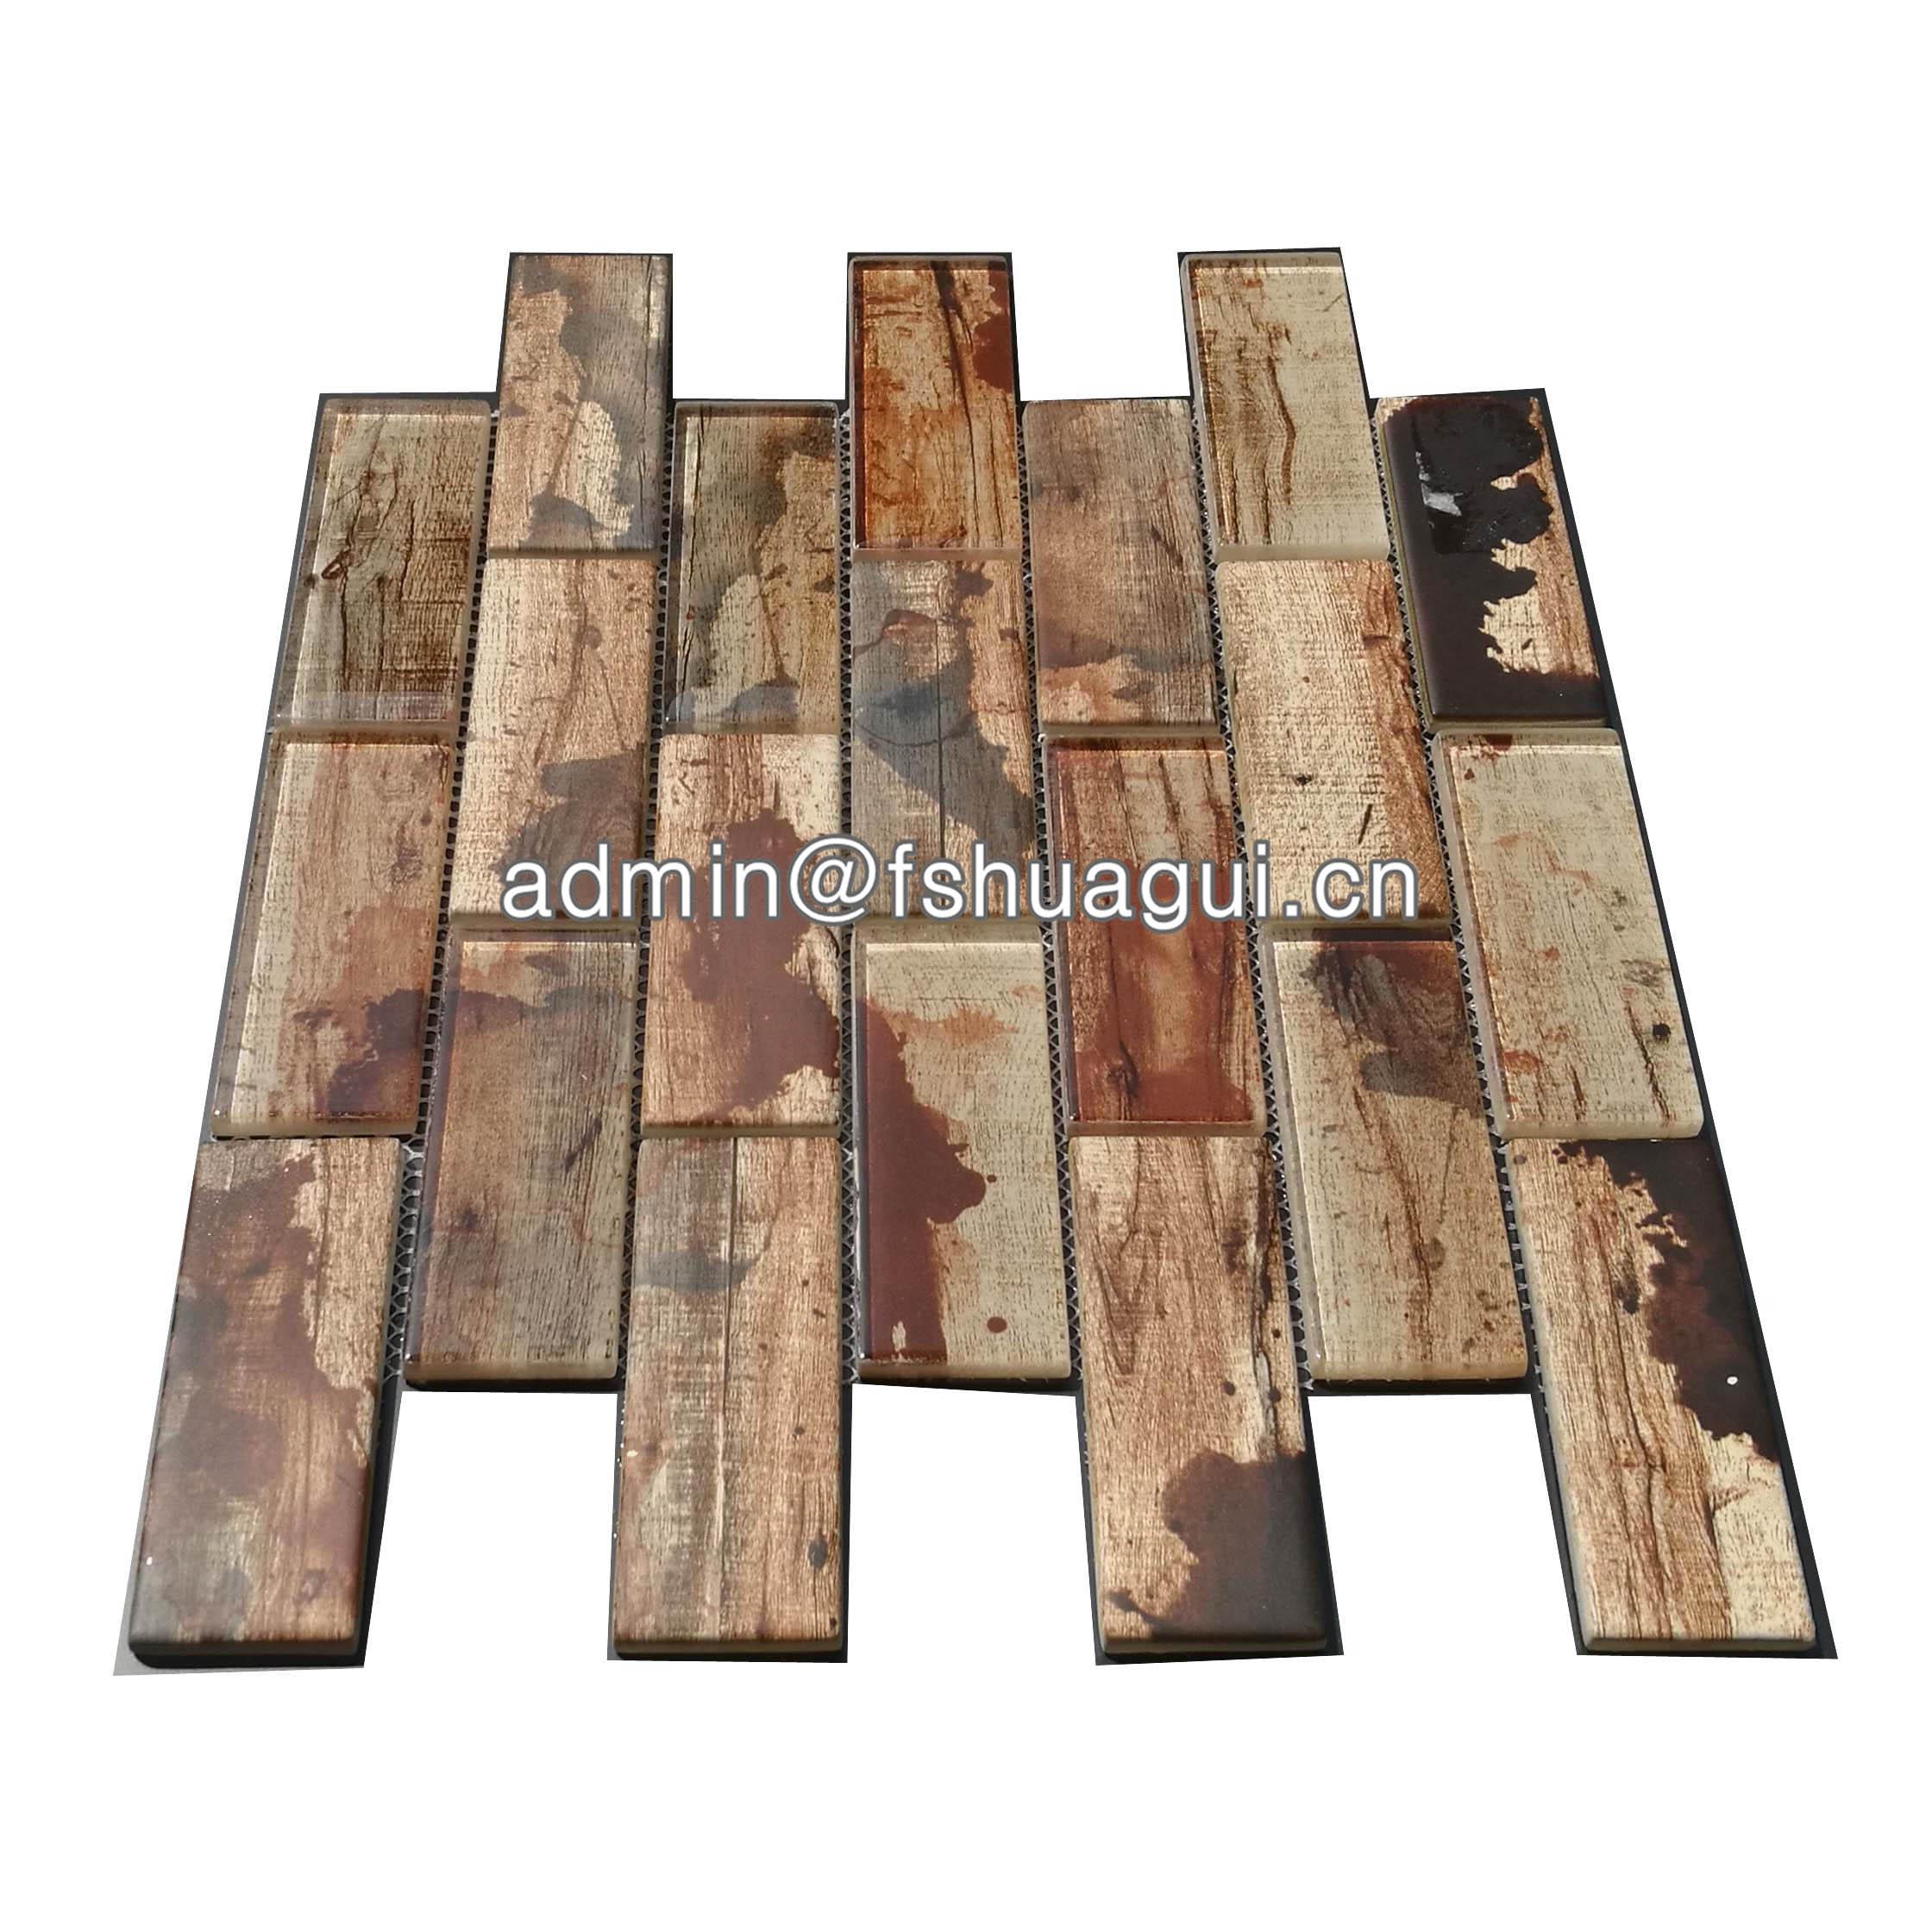 Huagui Inkjet glass mosaic kitchen backsplash tiles canada HG-WJ411 GLASS SUBWAY TILE image3